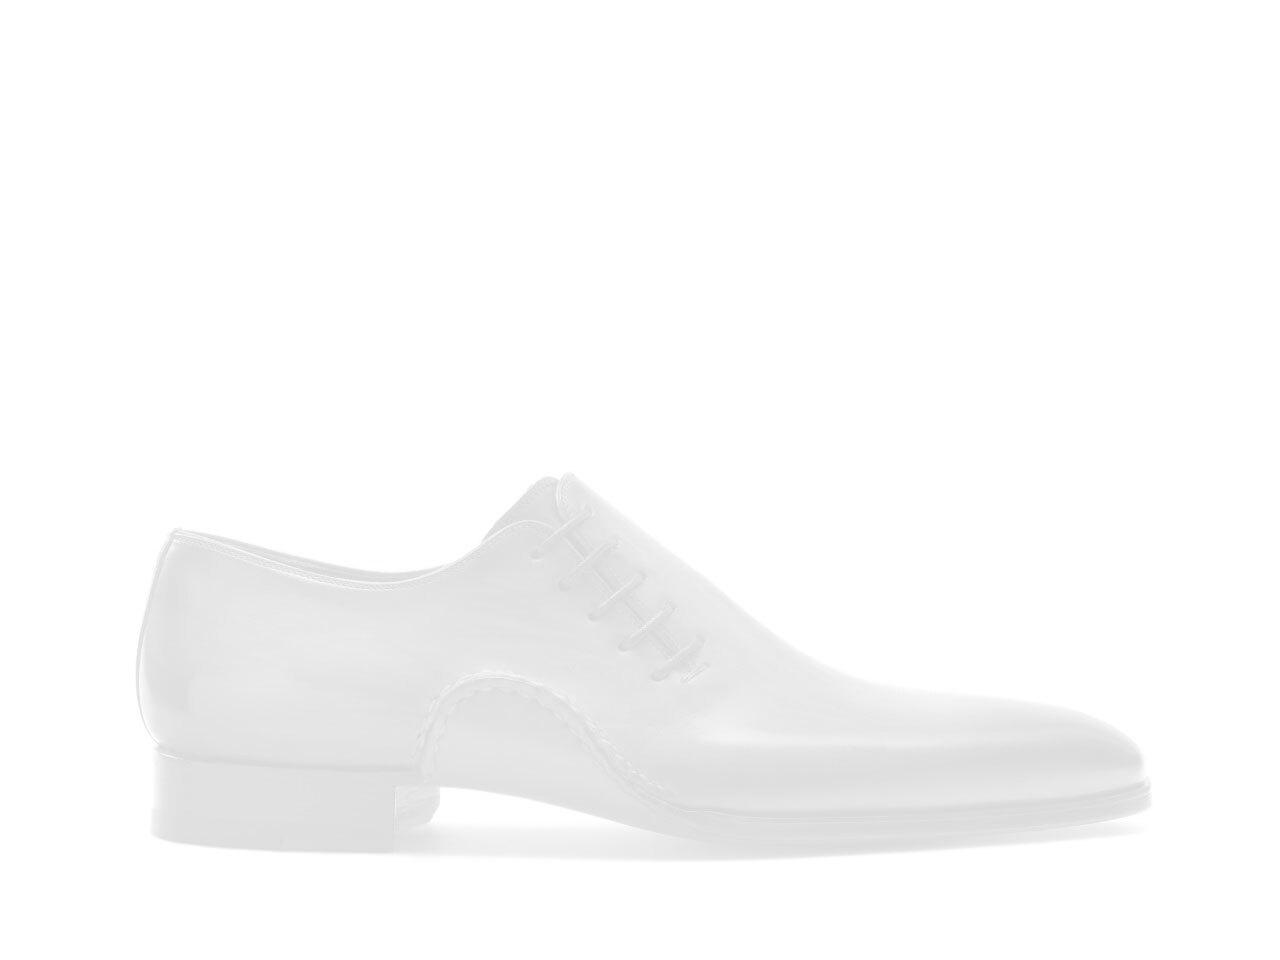 Pair of the Magnanni Jethro Cuero Men's Oxford Shoes